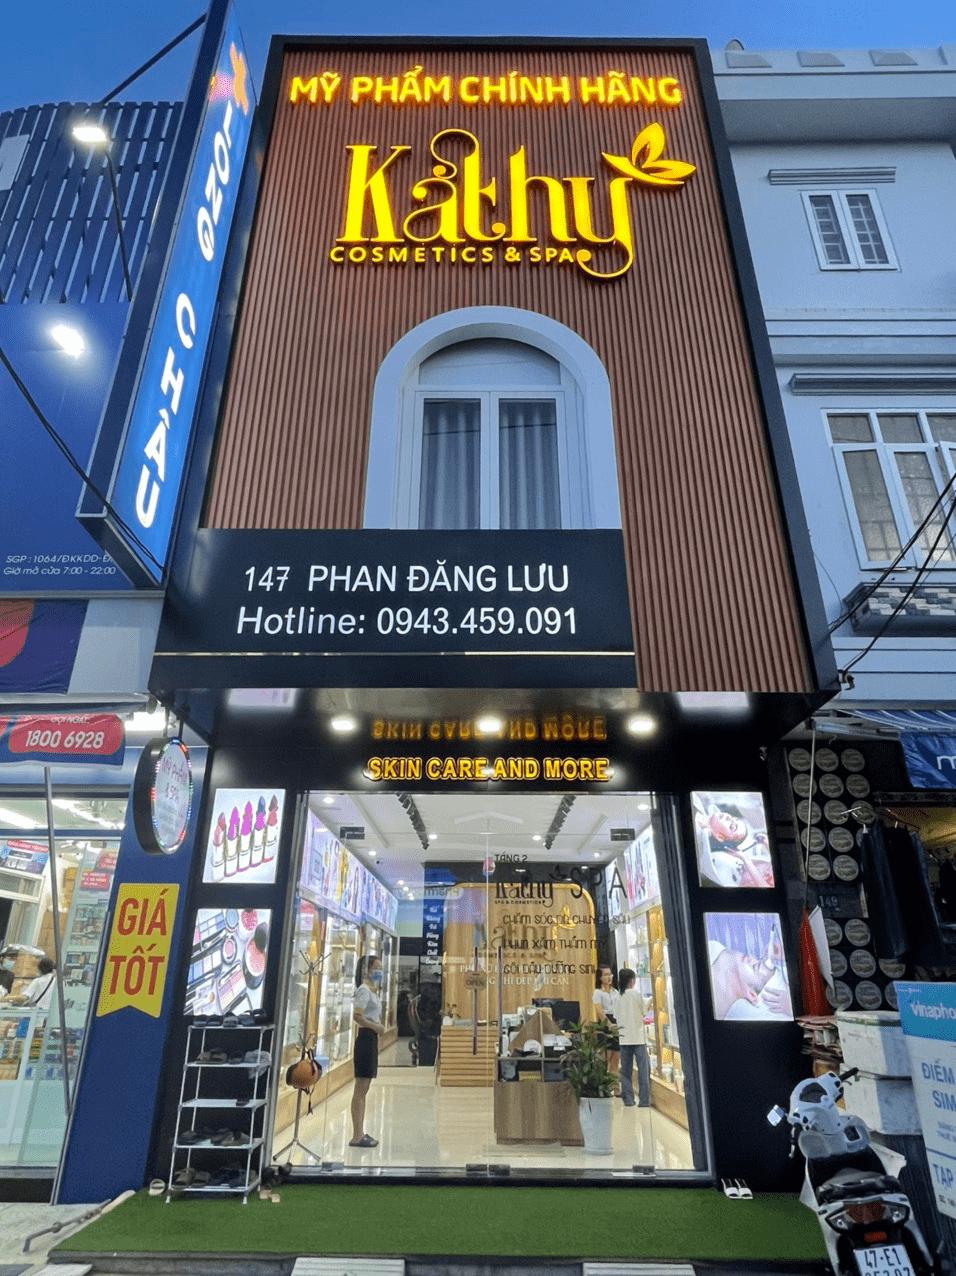 Kathy Cosmetics & Spa